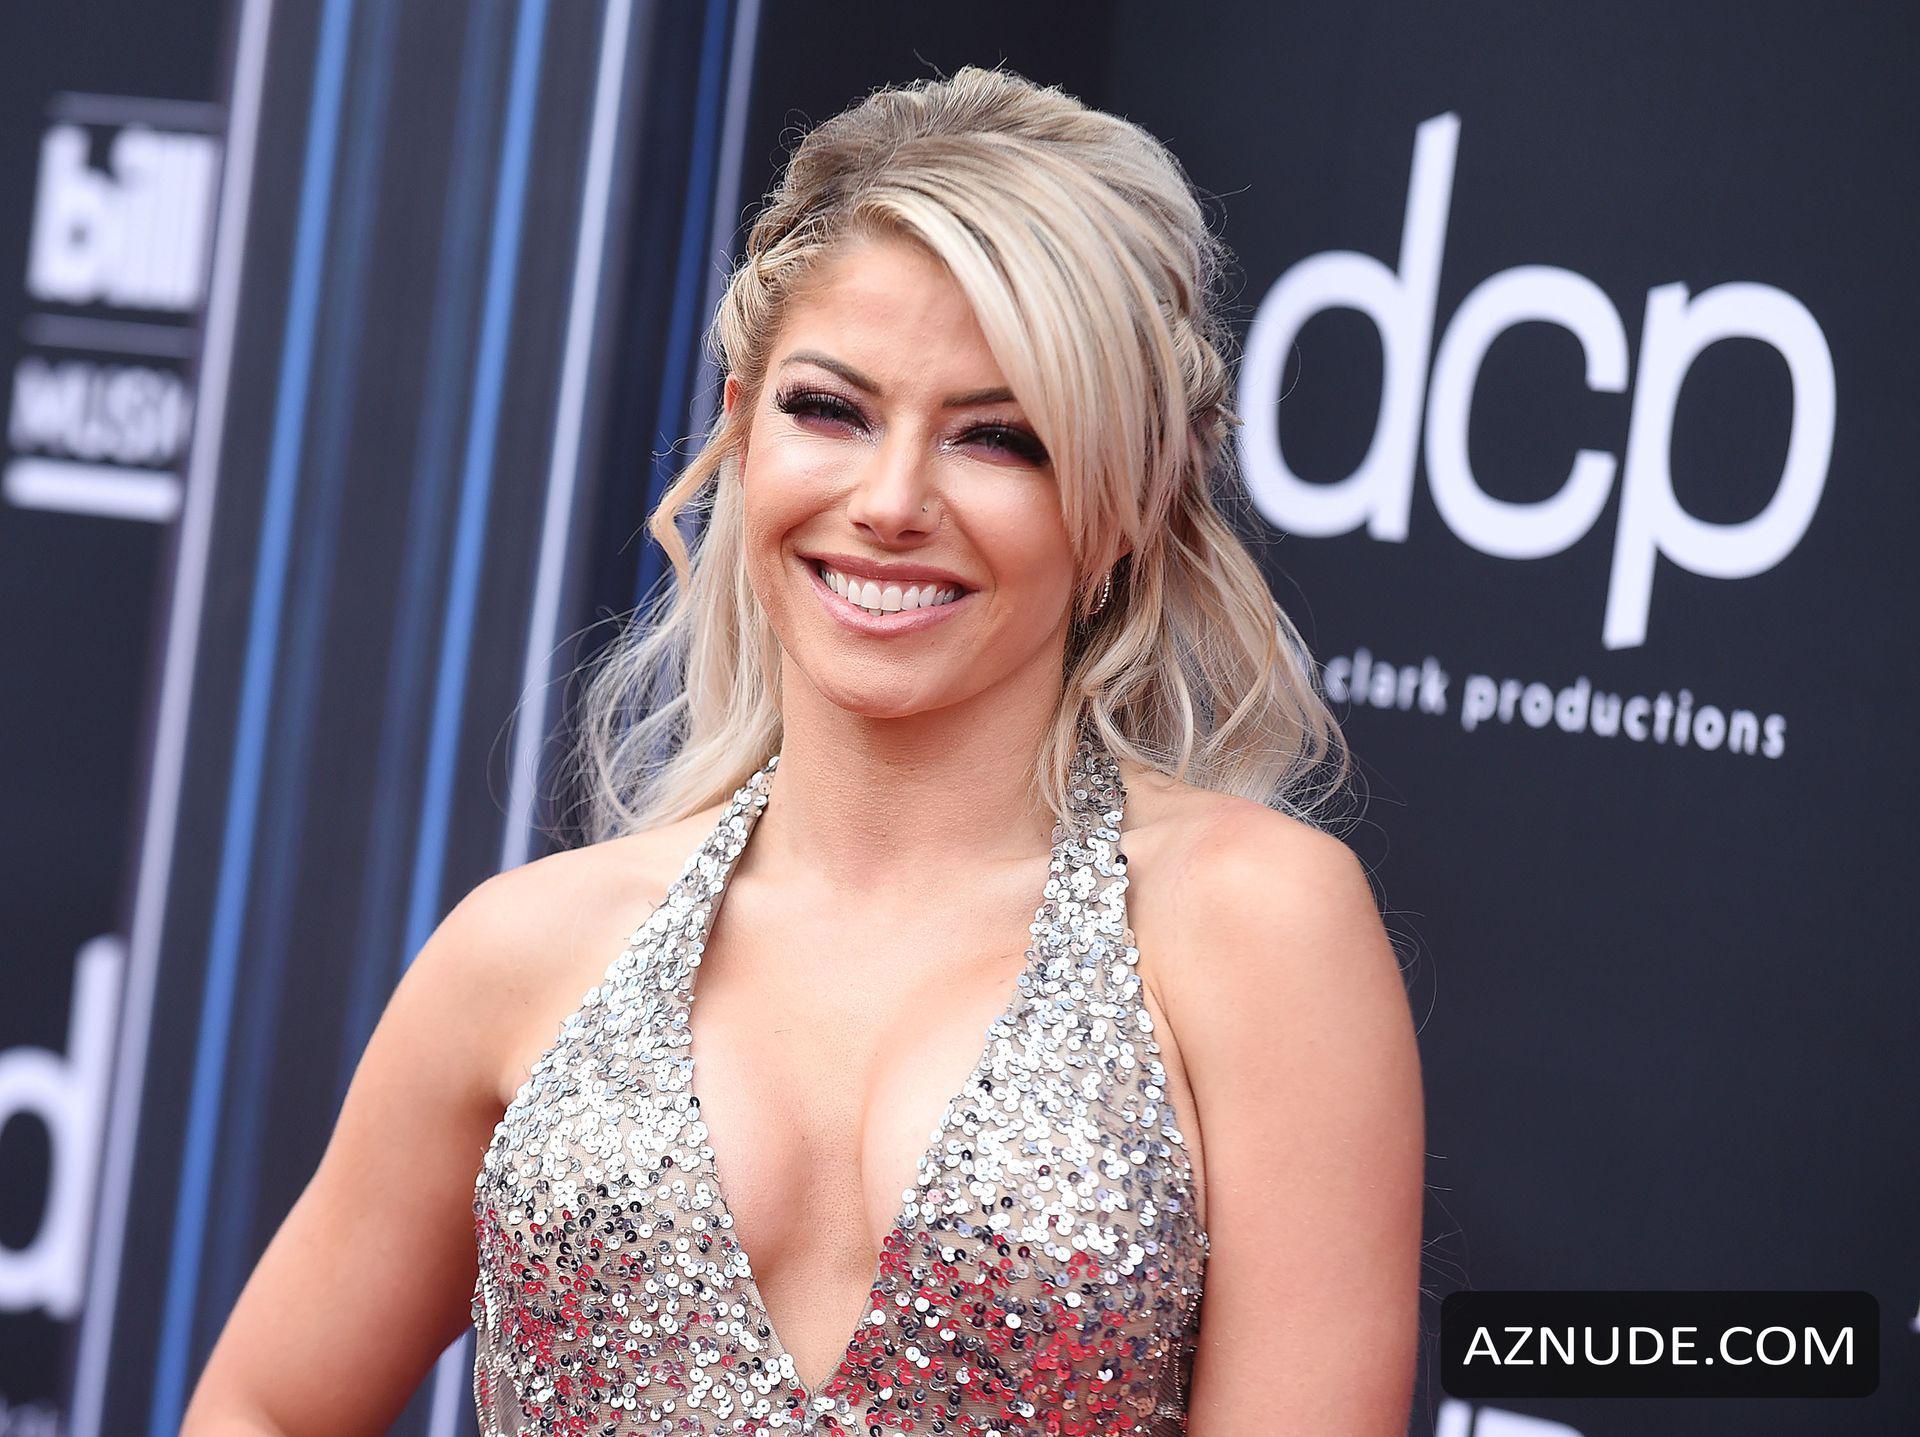 Alexa Bliss Porn alexa bliss nude - aznude